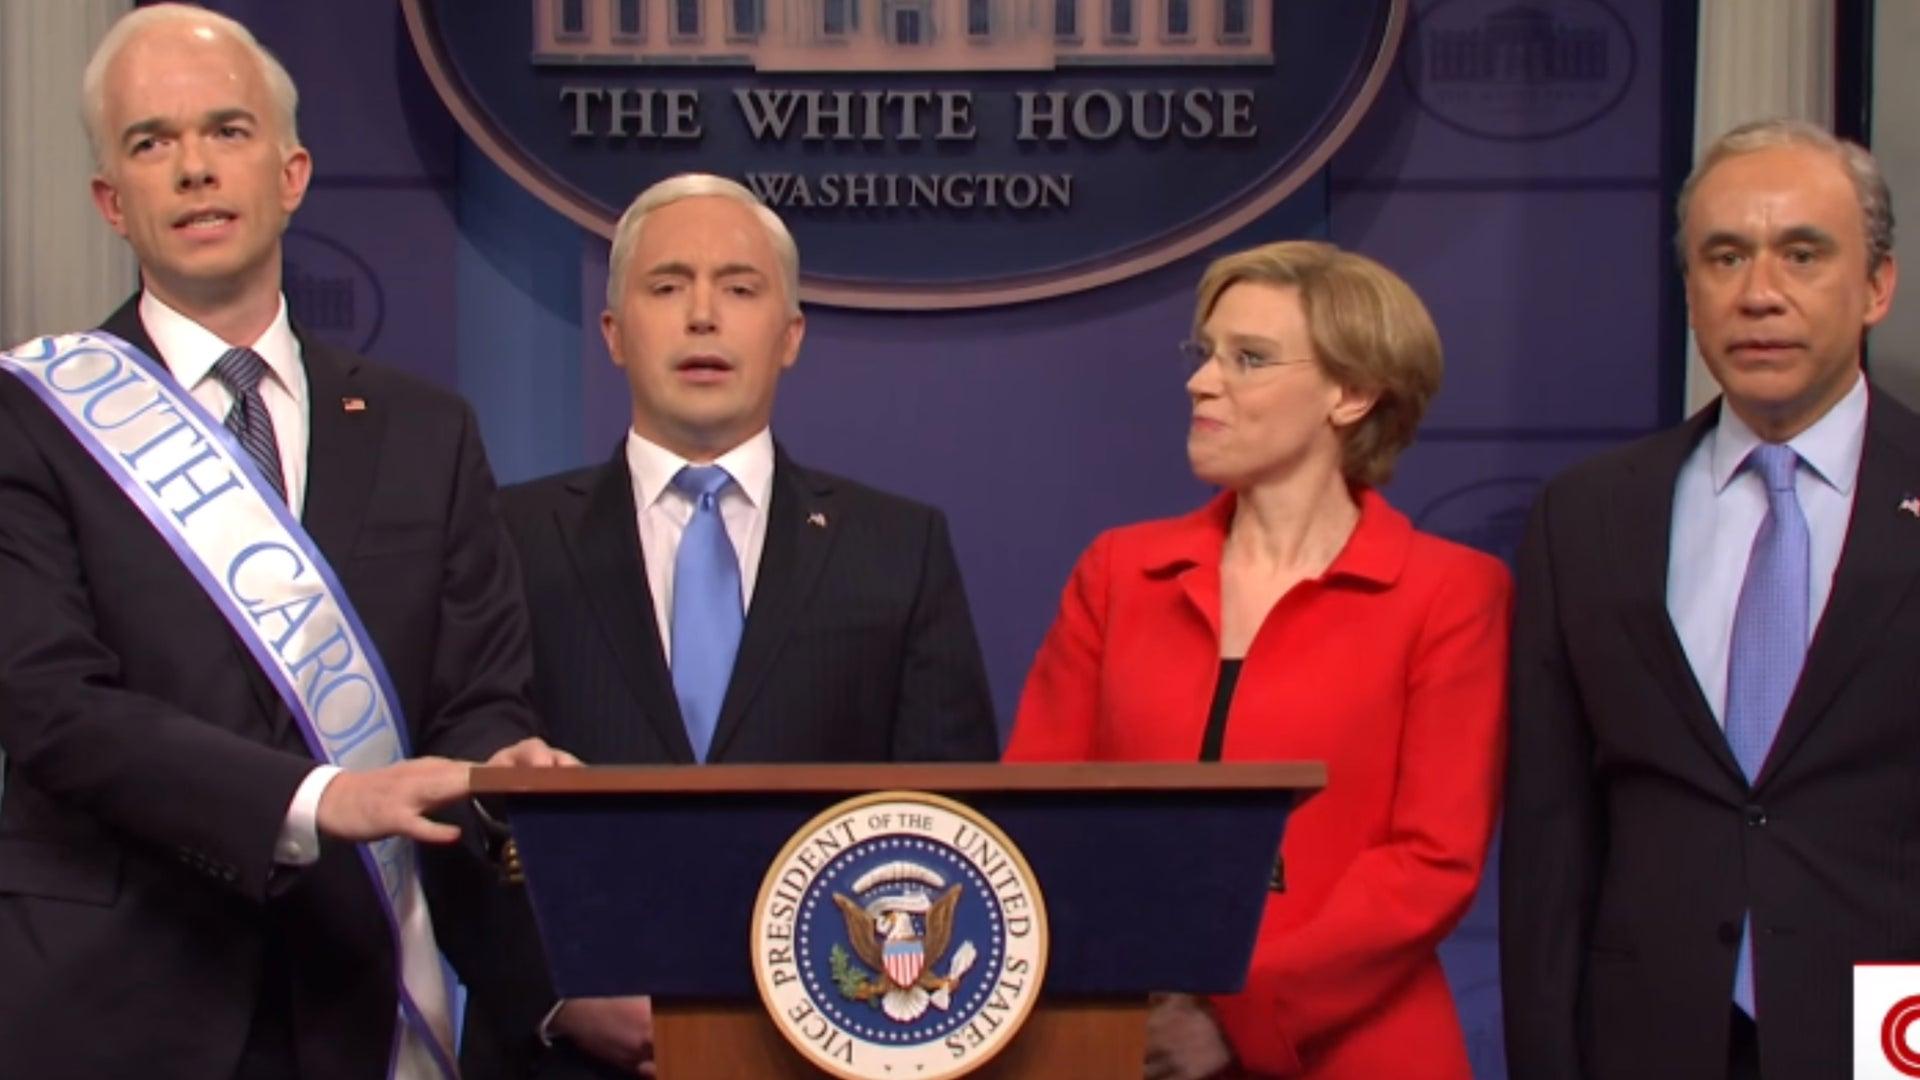 John Mulaney, Beck Bennett, Kate McKinnon, and Fred Armisen, Saturday Night Live